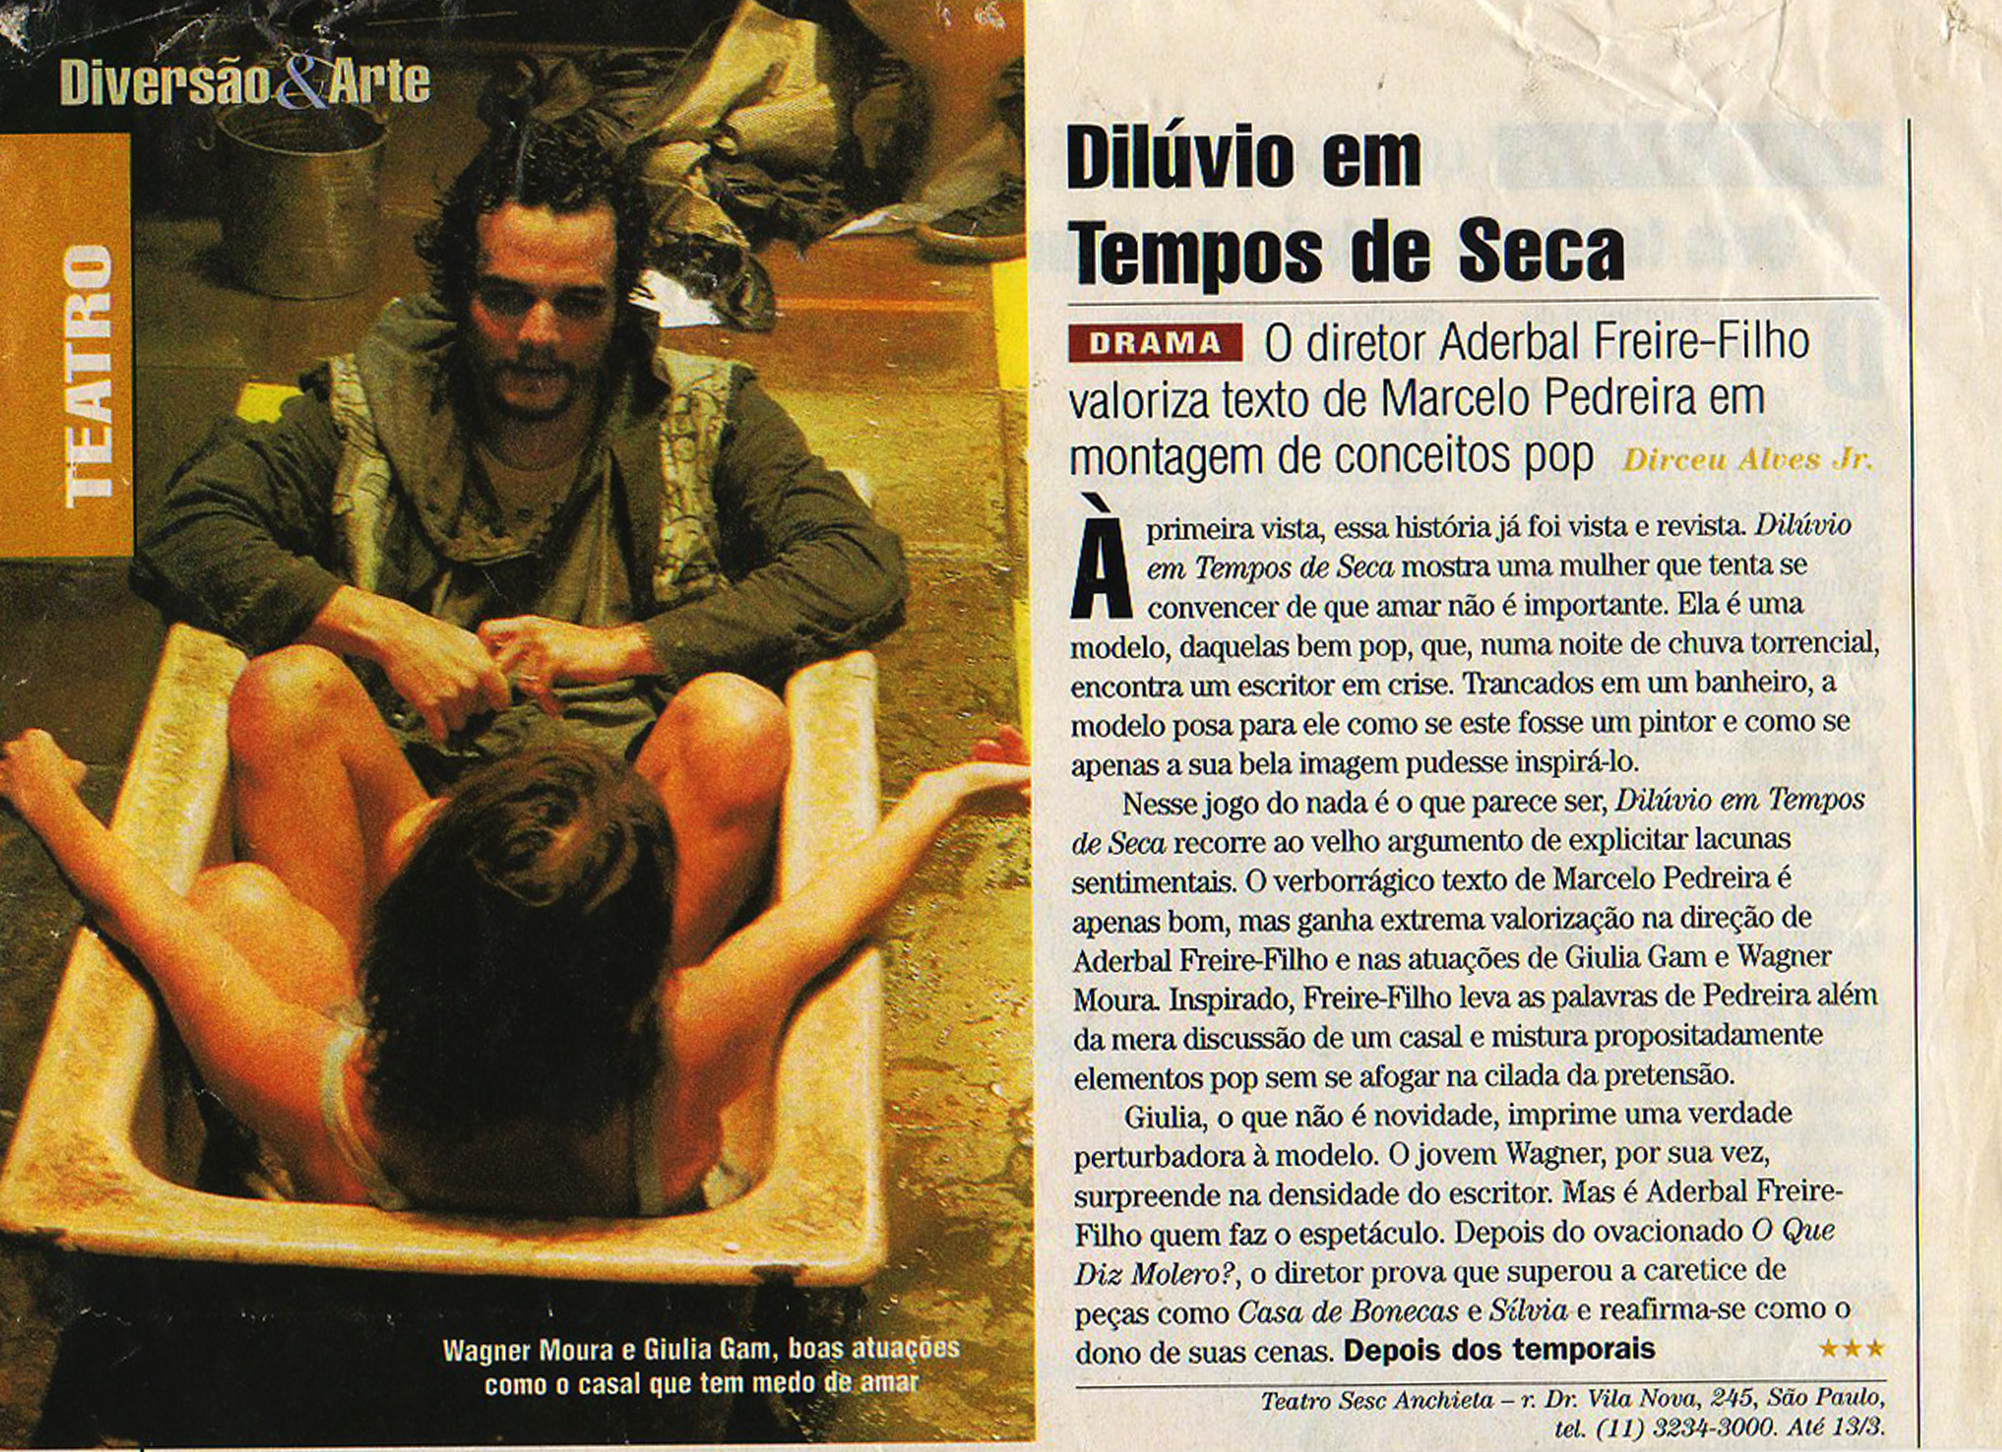 Diluvio+Playboy.jpg